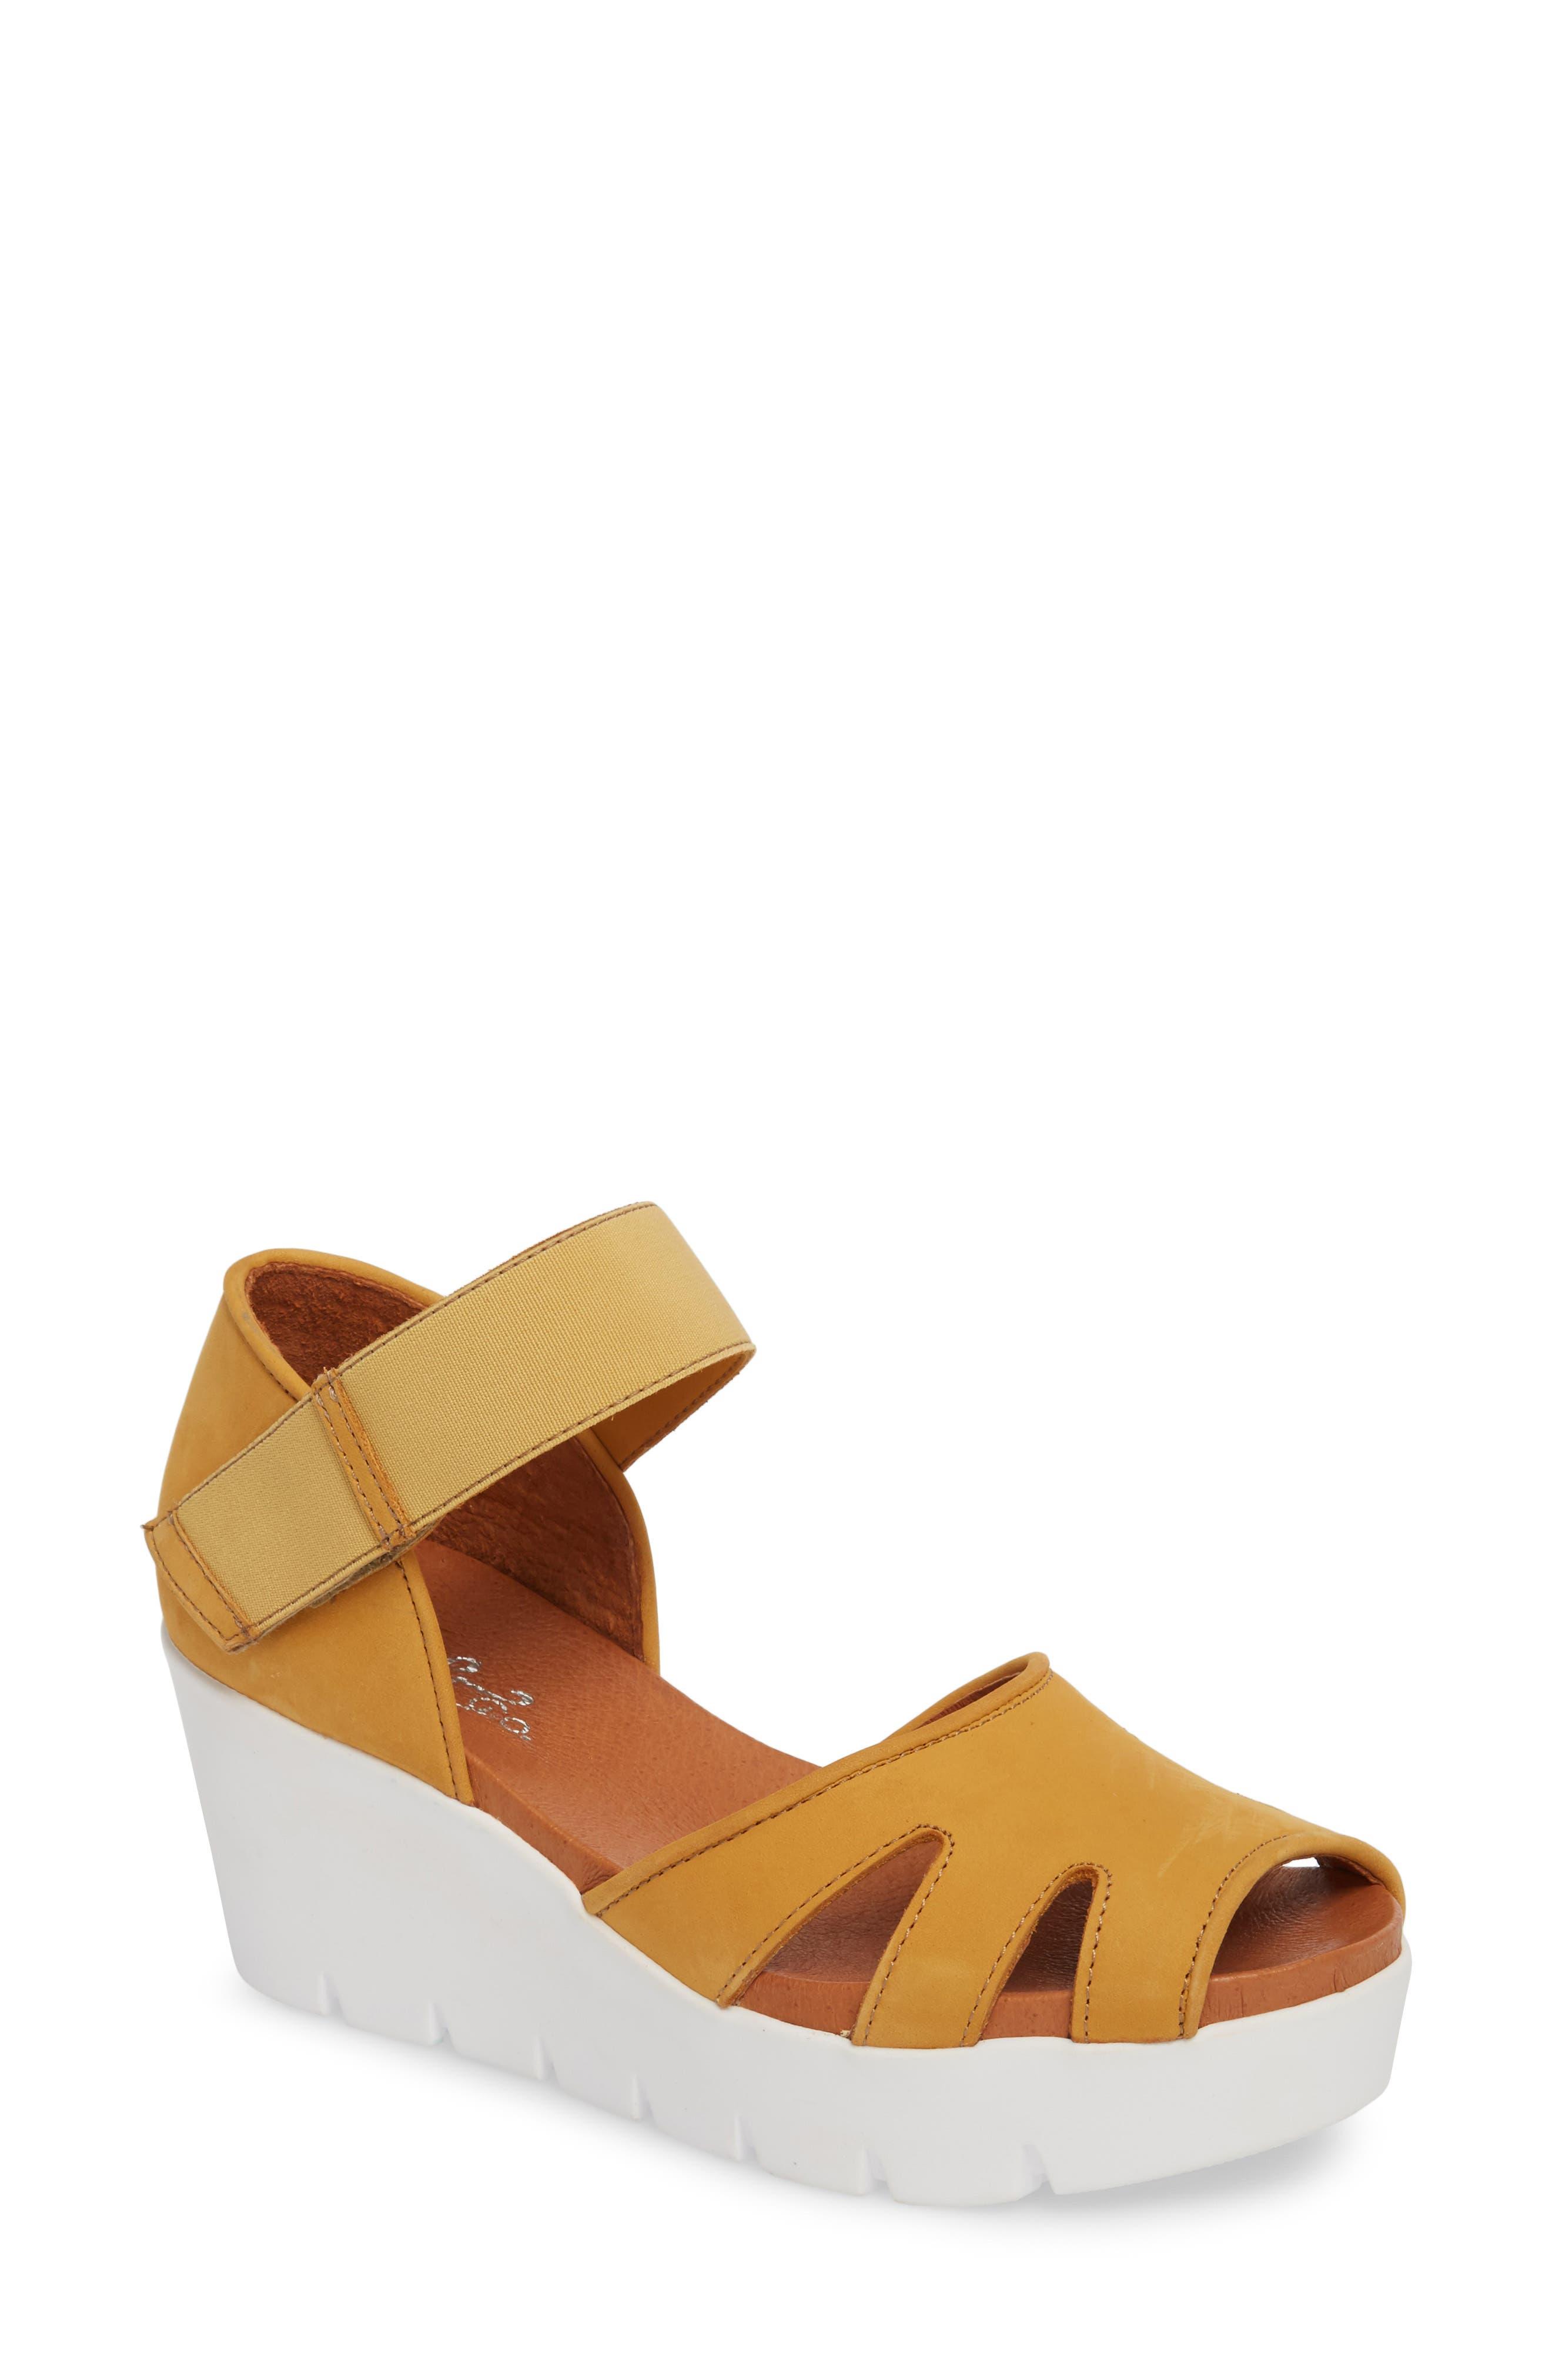 Bos. & Co. Sharon Platform Wedge Sandal - Yellow